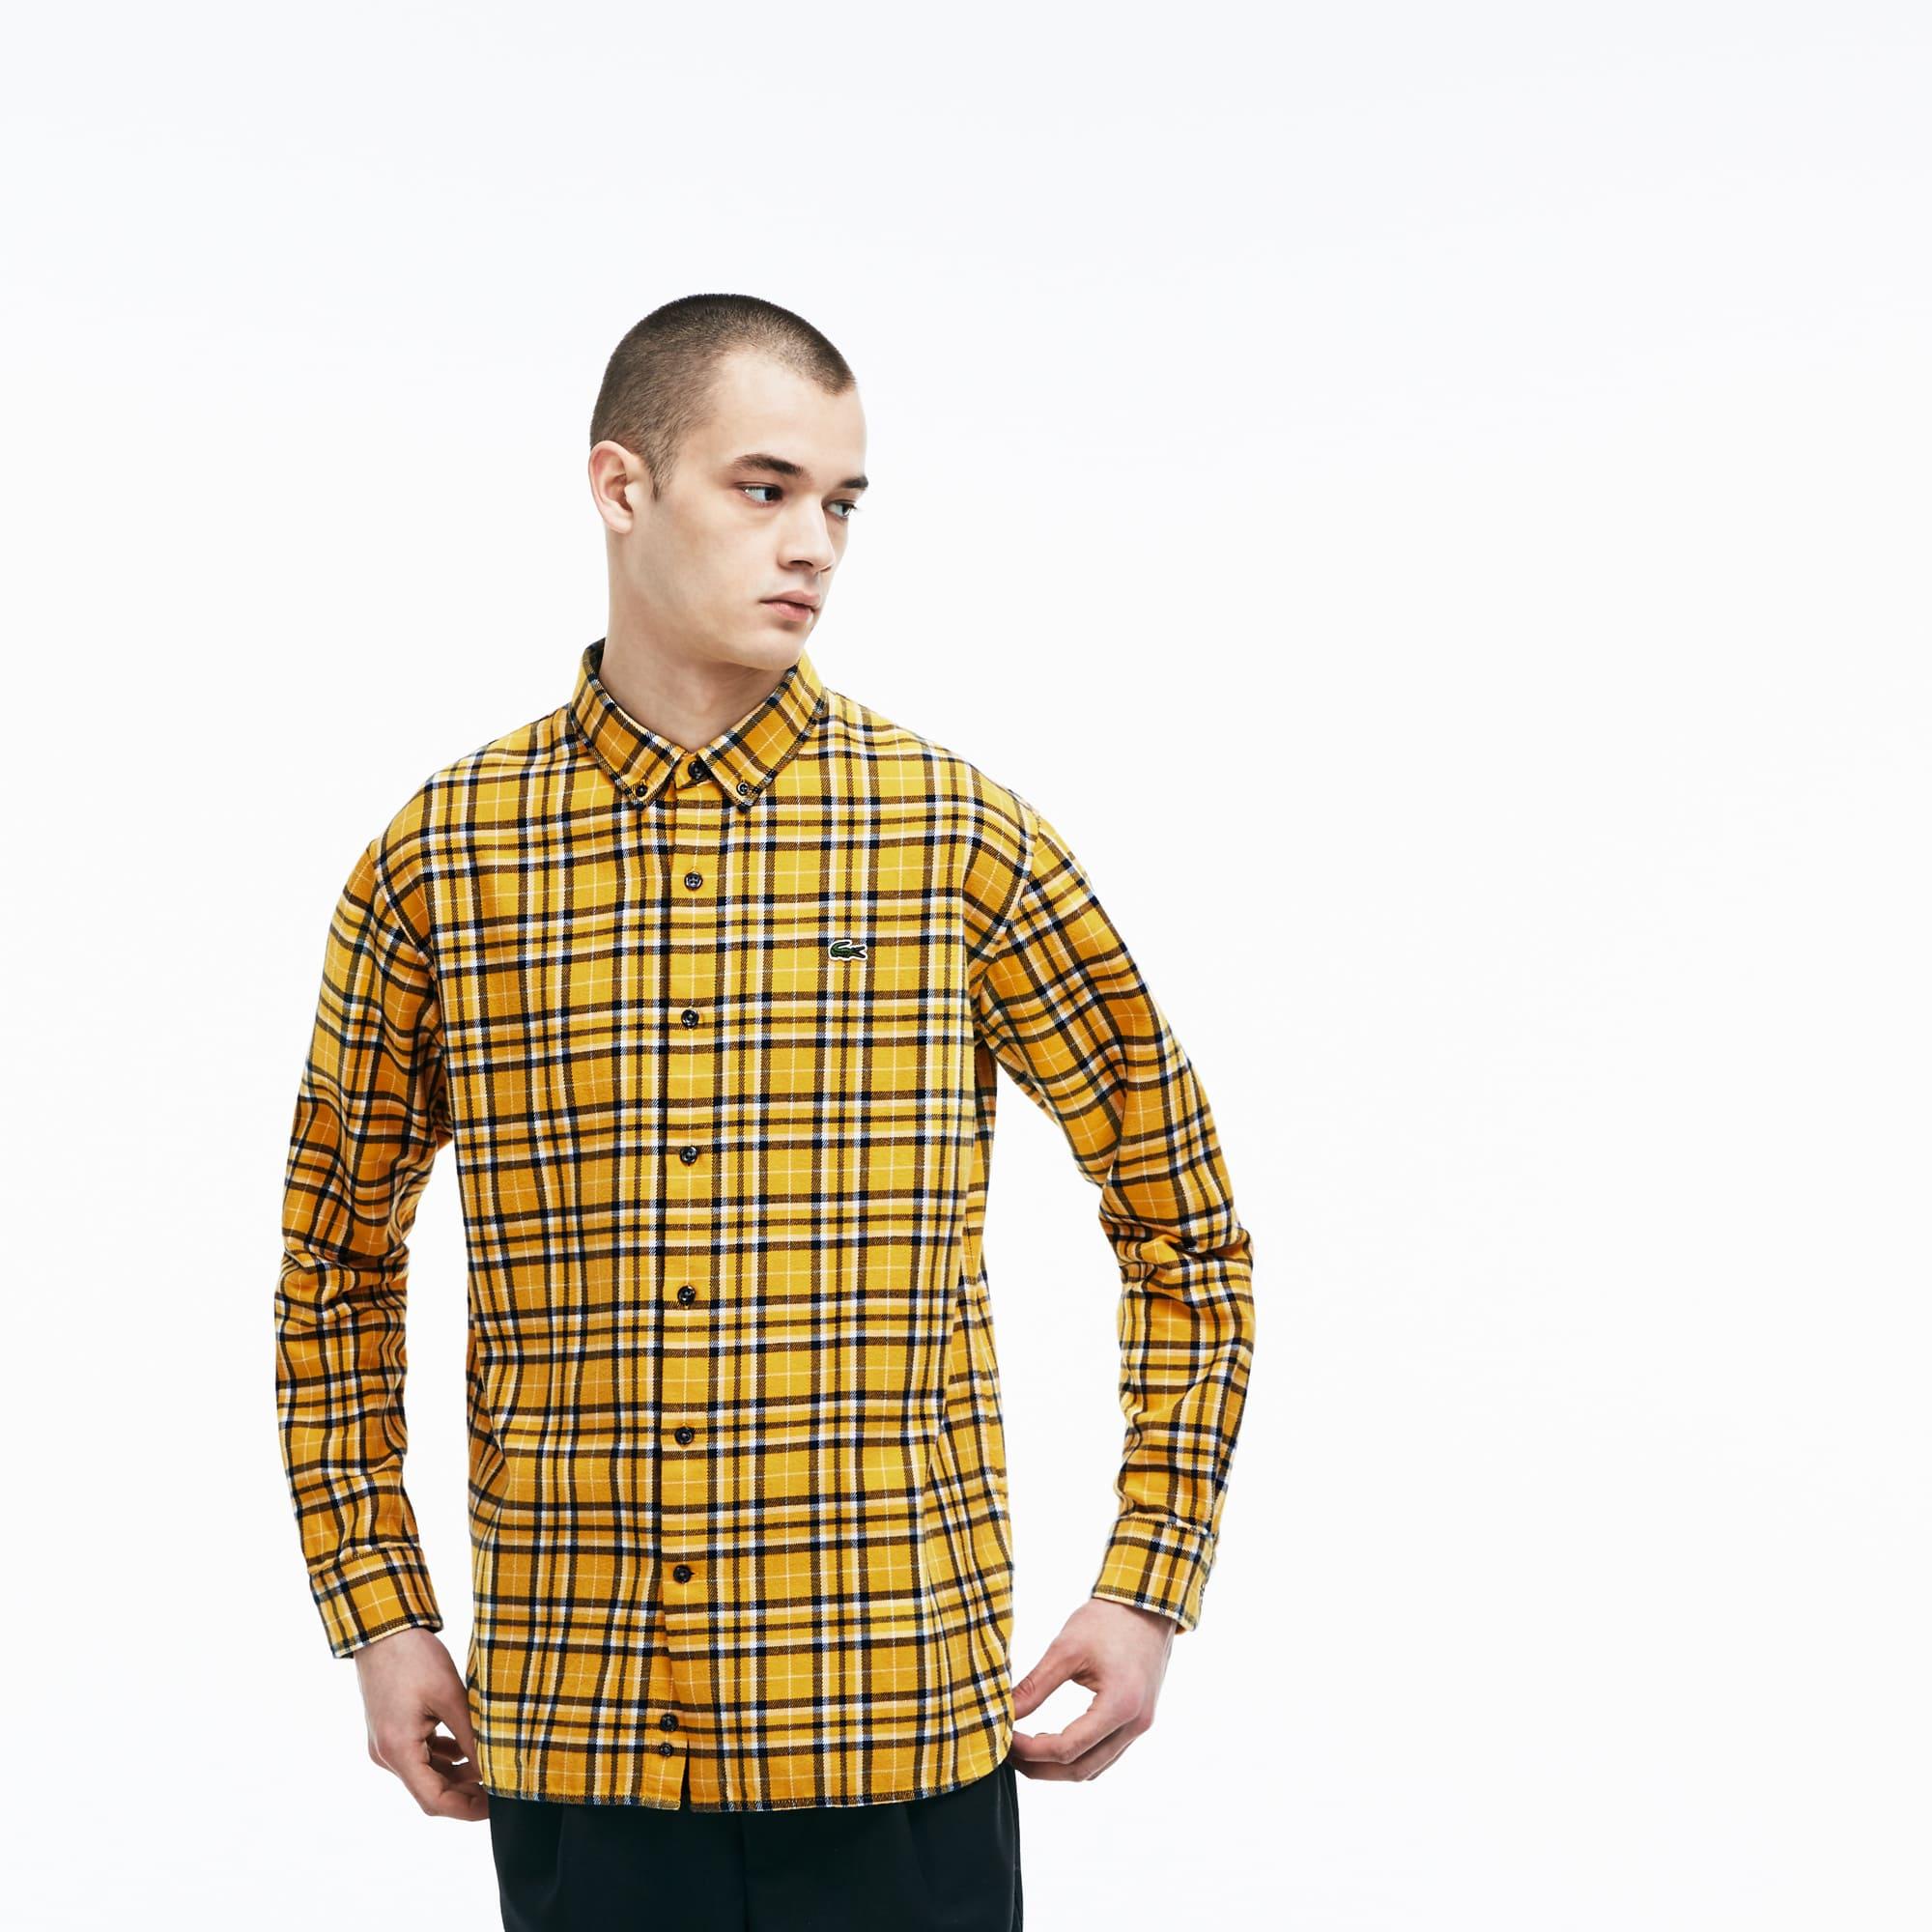 Boxy Fit Herren-Hemd aus kariertem Baumwollflanell LACOSTE L!VE